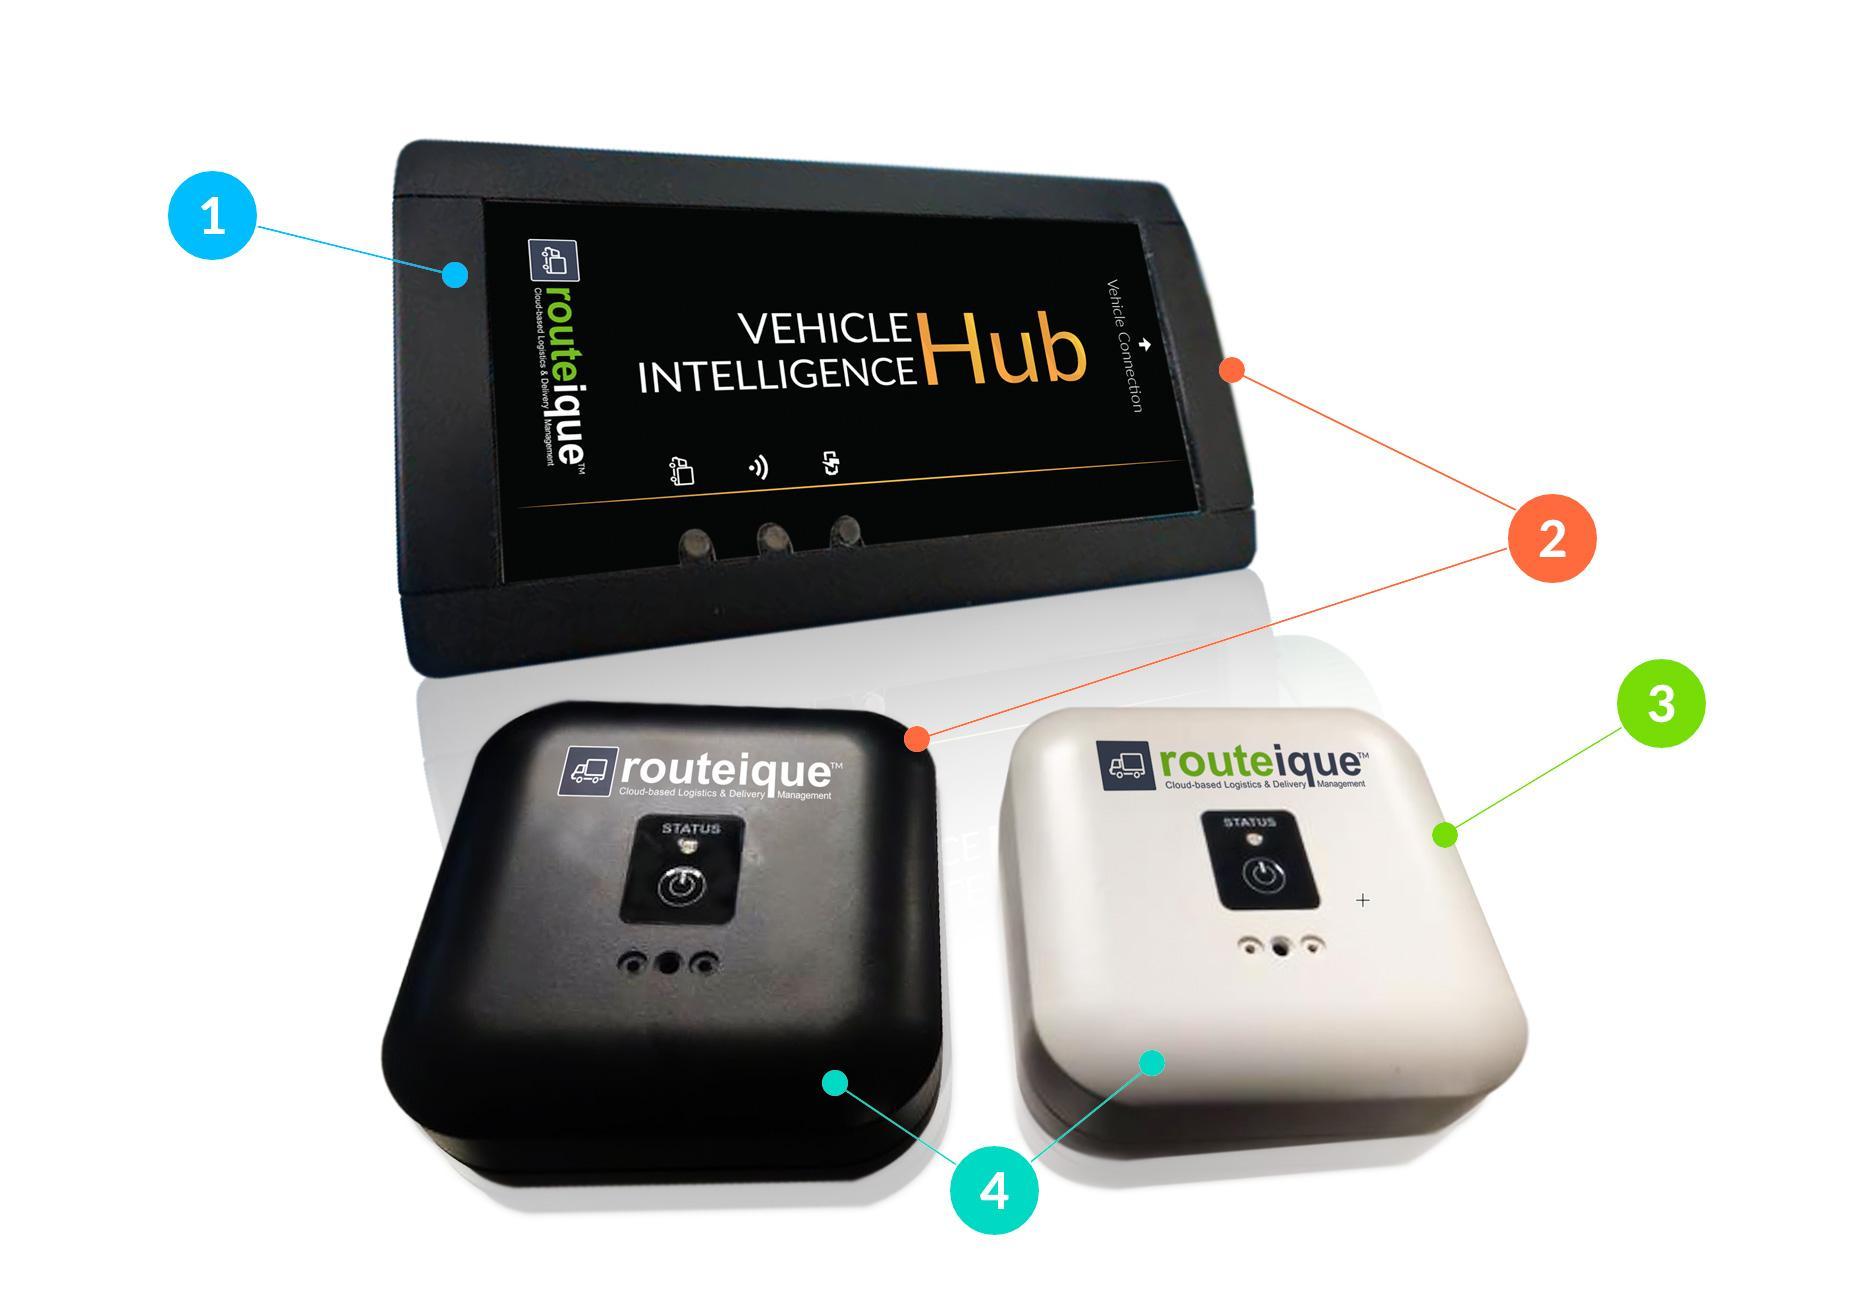 vehicle intelligence, sensors and telematics